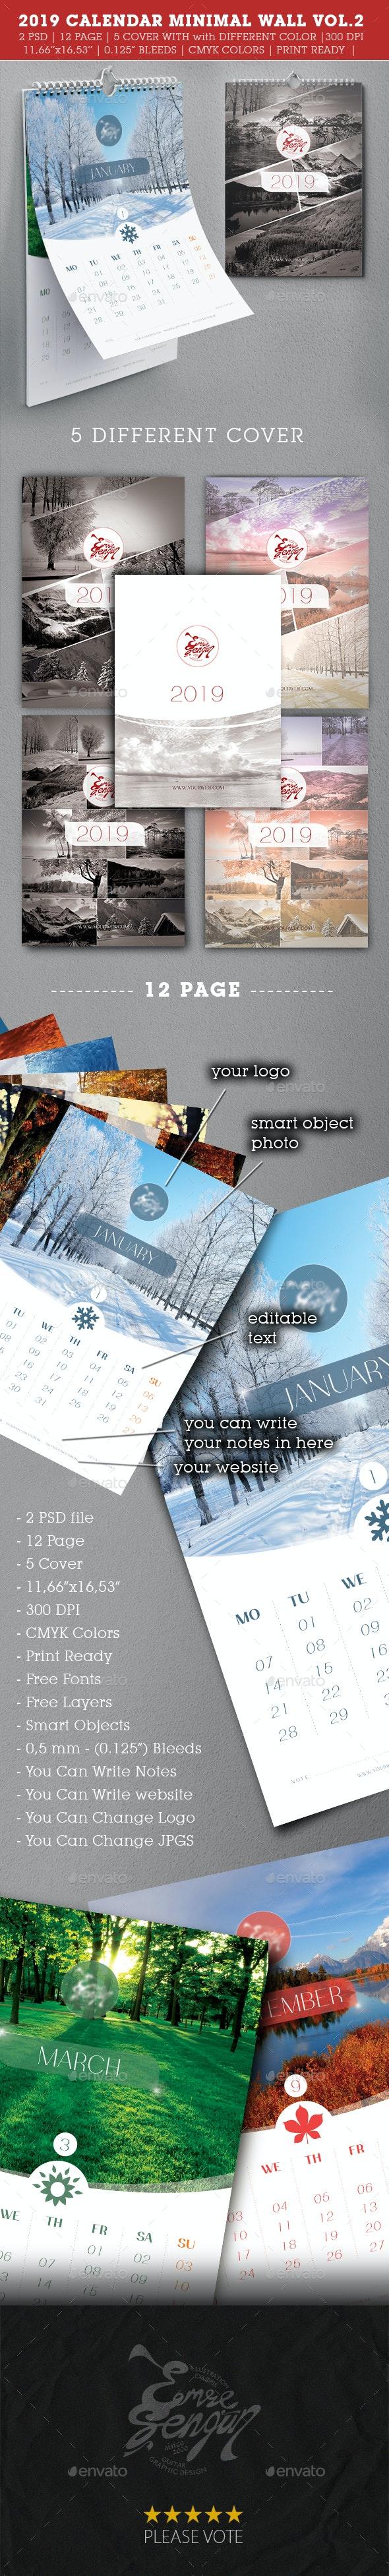 2019 Wall Calendar Minimal Vol.2 - Calendars Stationery